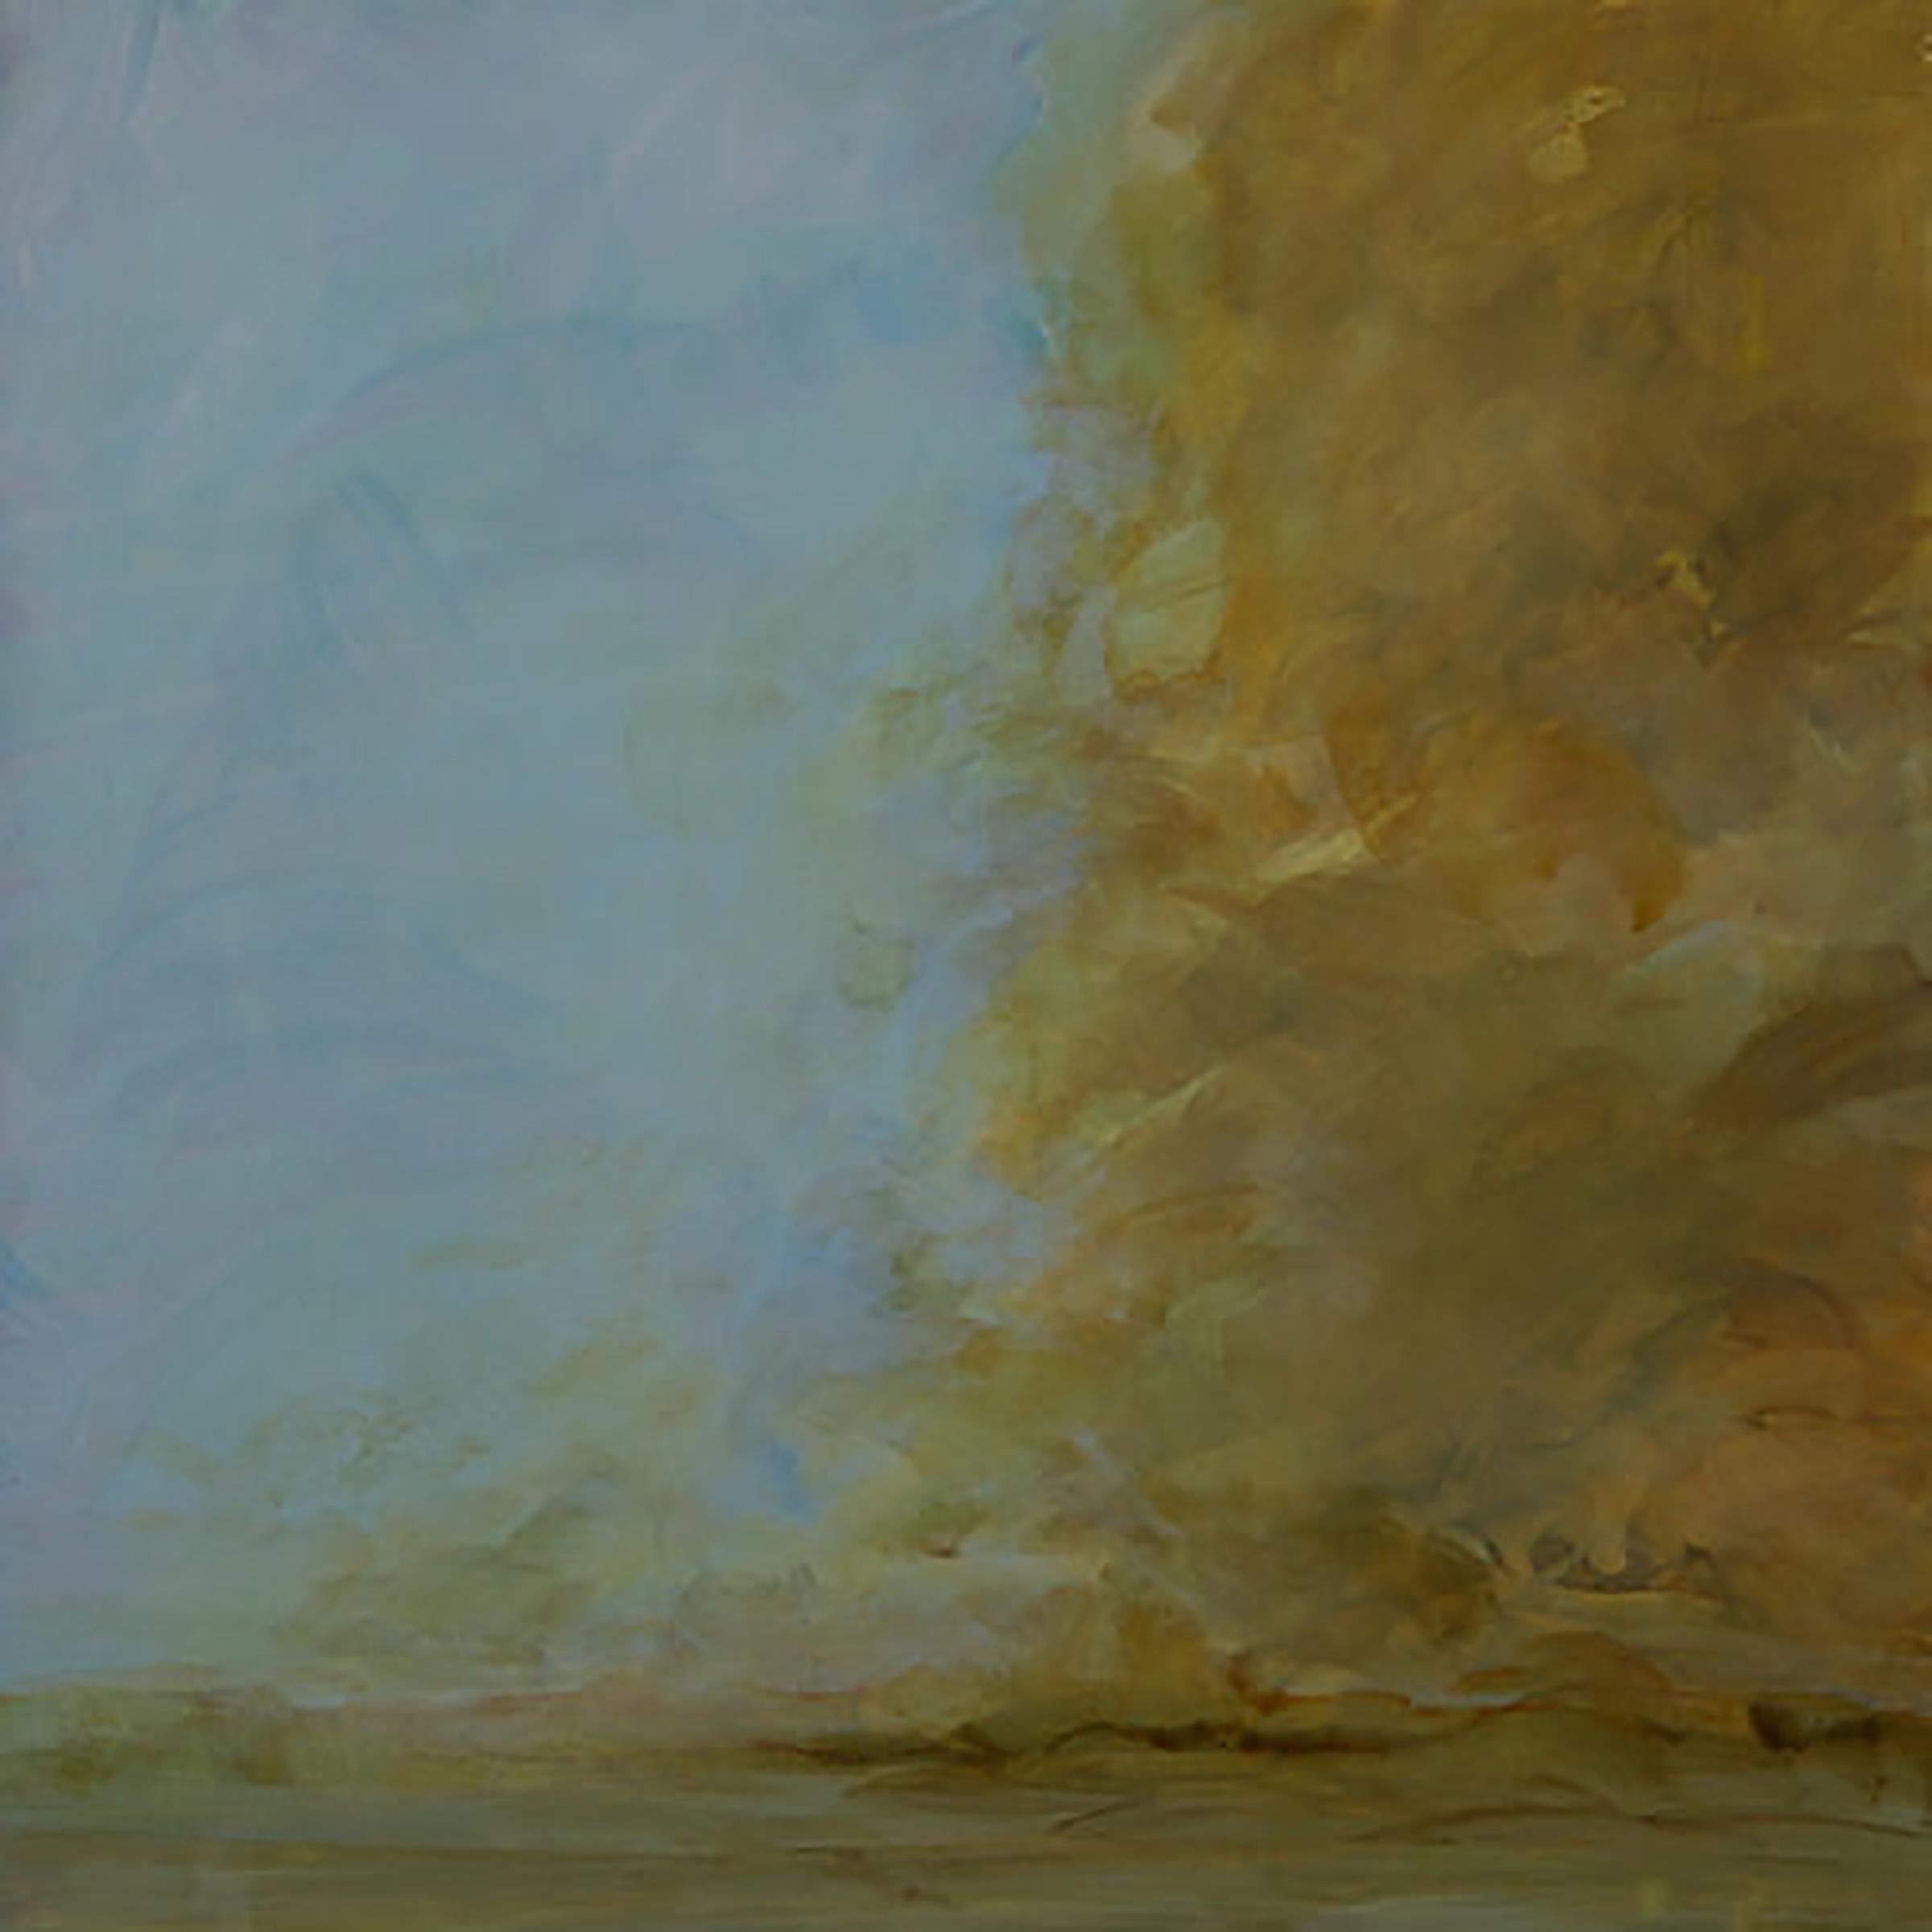 "SAND STORM 1 (24X24"") 2010"